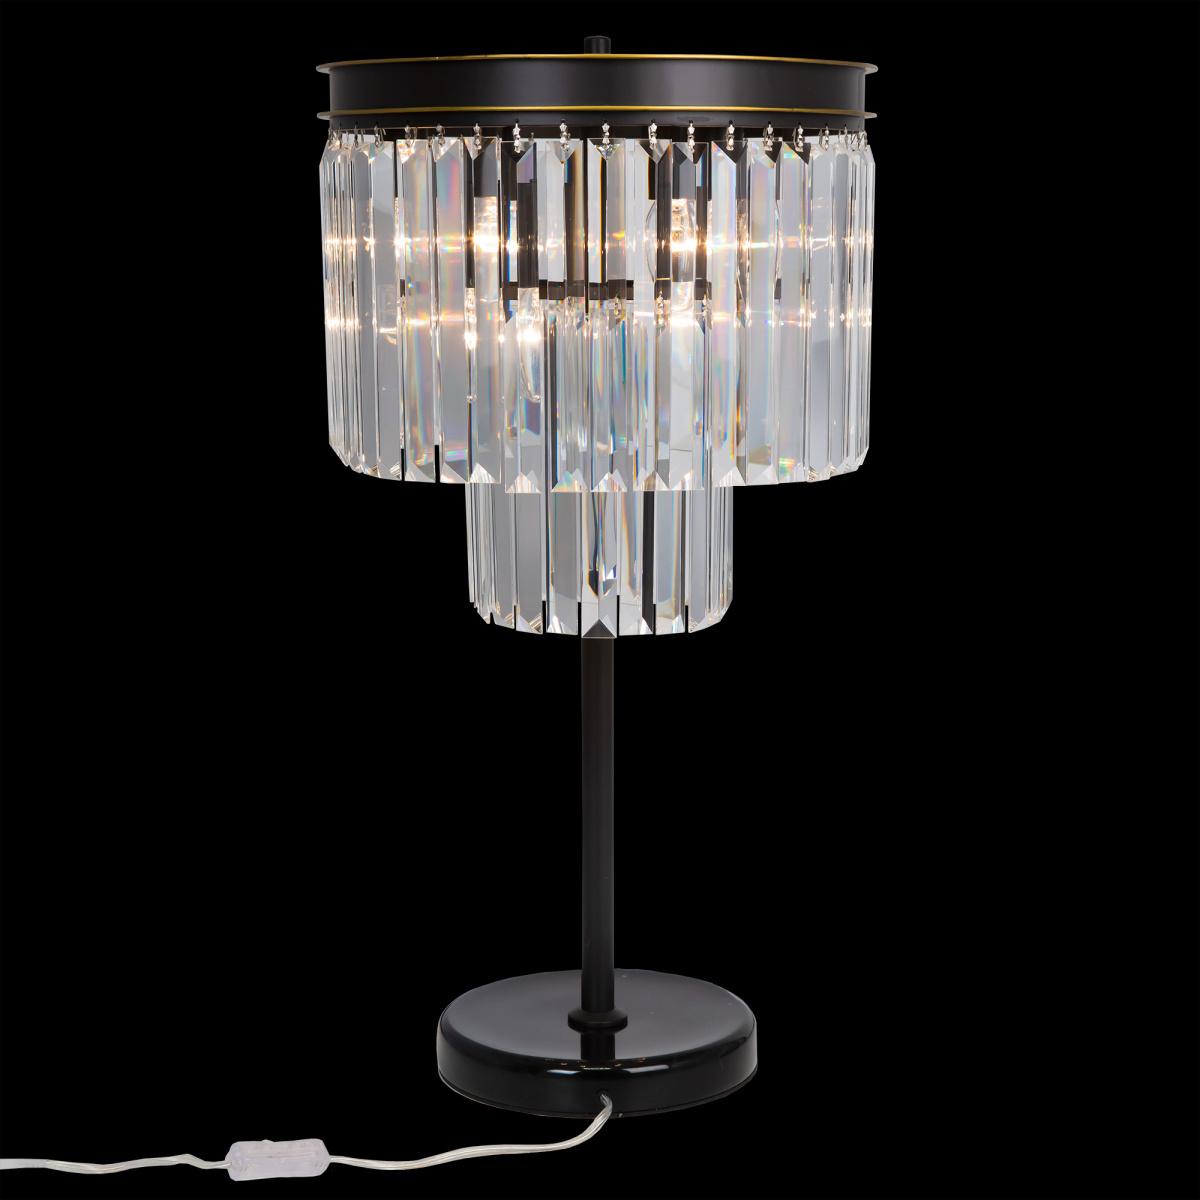 Настольная лампа Citilux Мартин CL332861, 6xE14x60W, венге, прозрачный, металл, хрусталь - фото 4